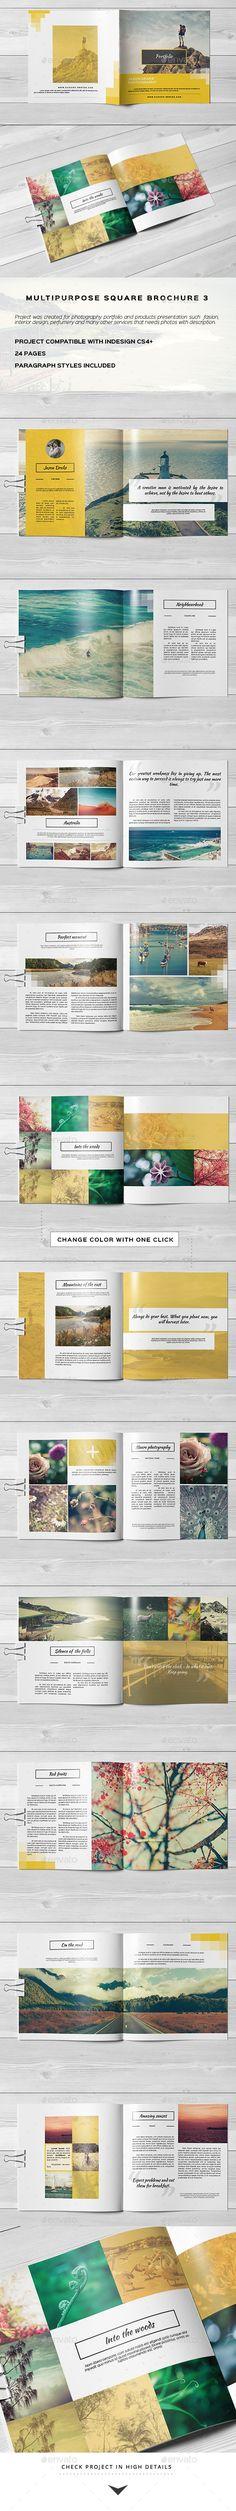 Multipurpose Square Brochure Template #design Download: http://graphicriver.net/item/multipurpose-square-brochure-3/11713434?ref=ksioks